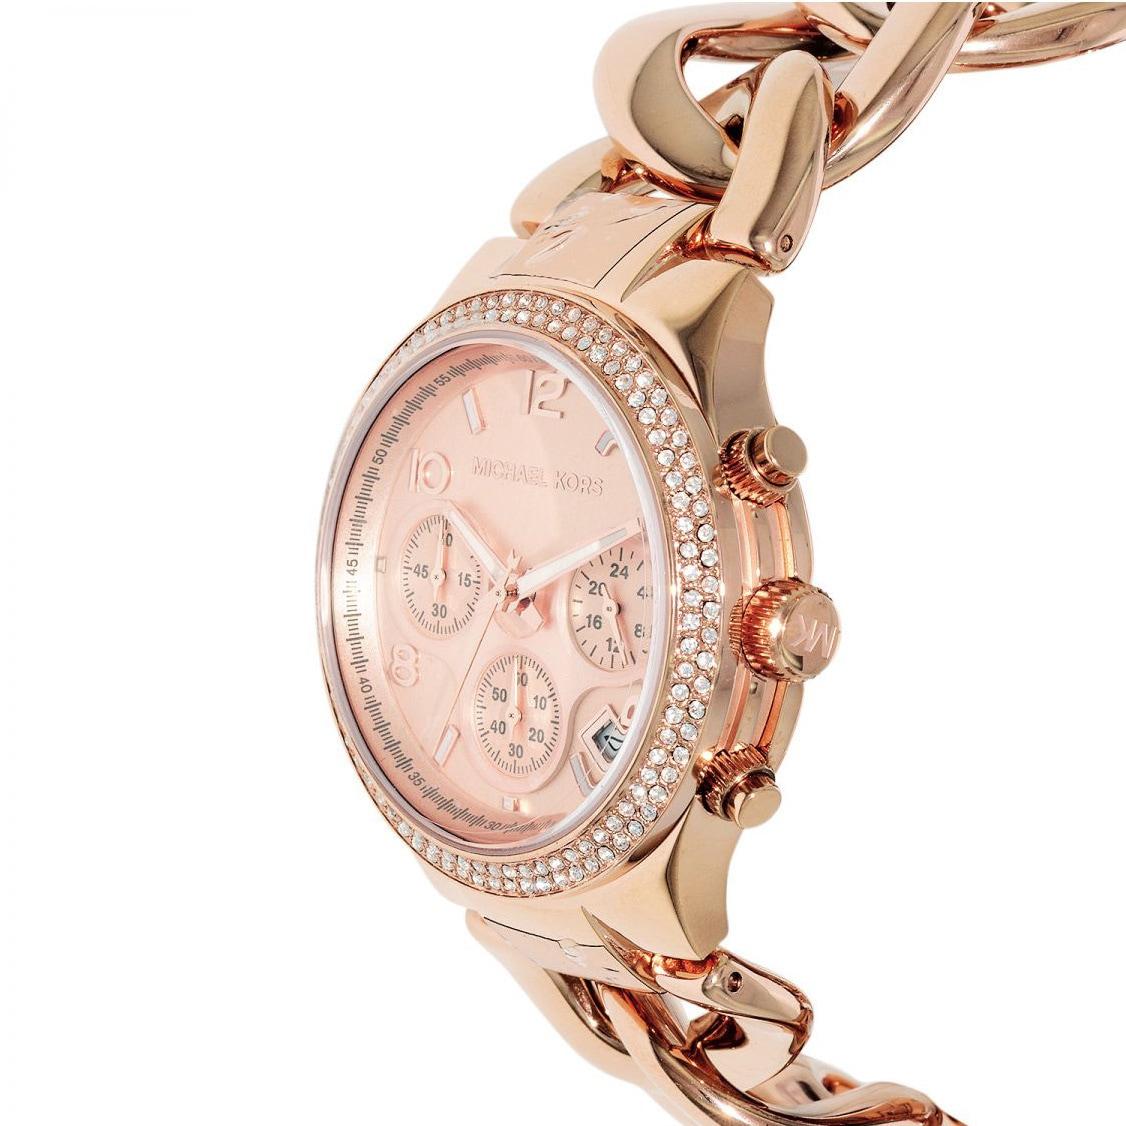 e0b7a5578e1c Shop Michael Kors Women s MK3247 Runway Twist Rosegold Watch - Free  Shipping Today - Overstock - 9194105